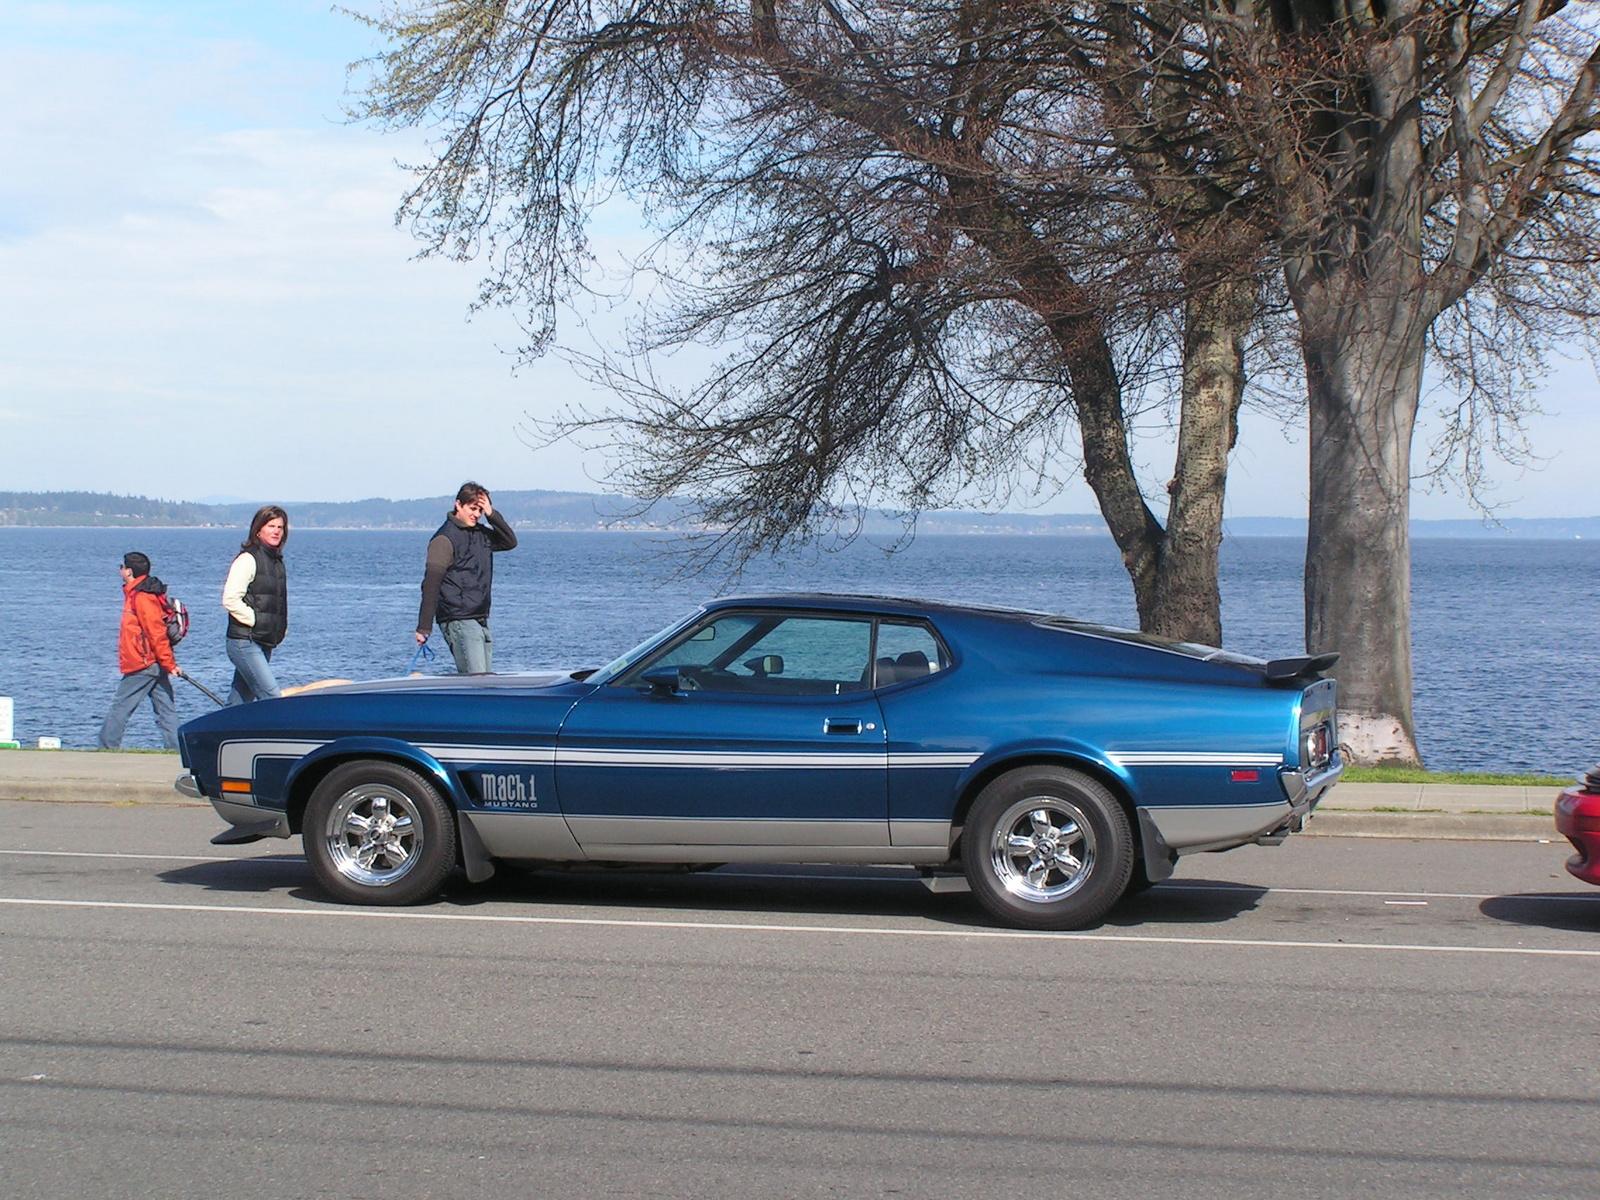 1971 Ford Mustang Mach 1, Seattle WA.